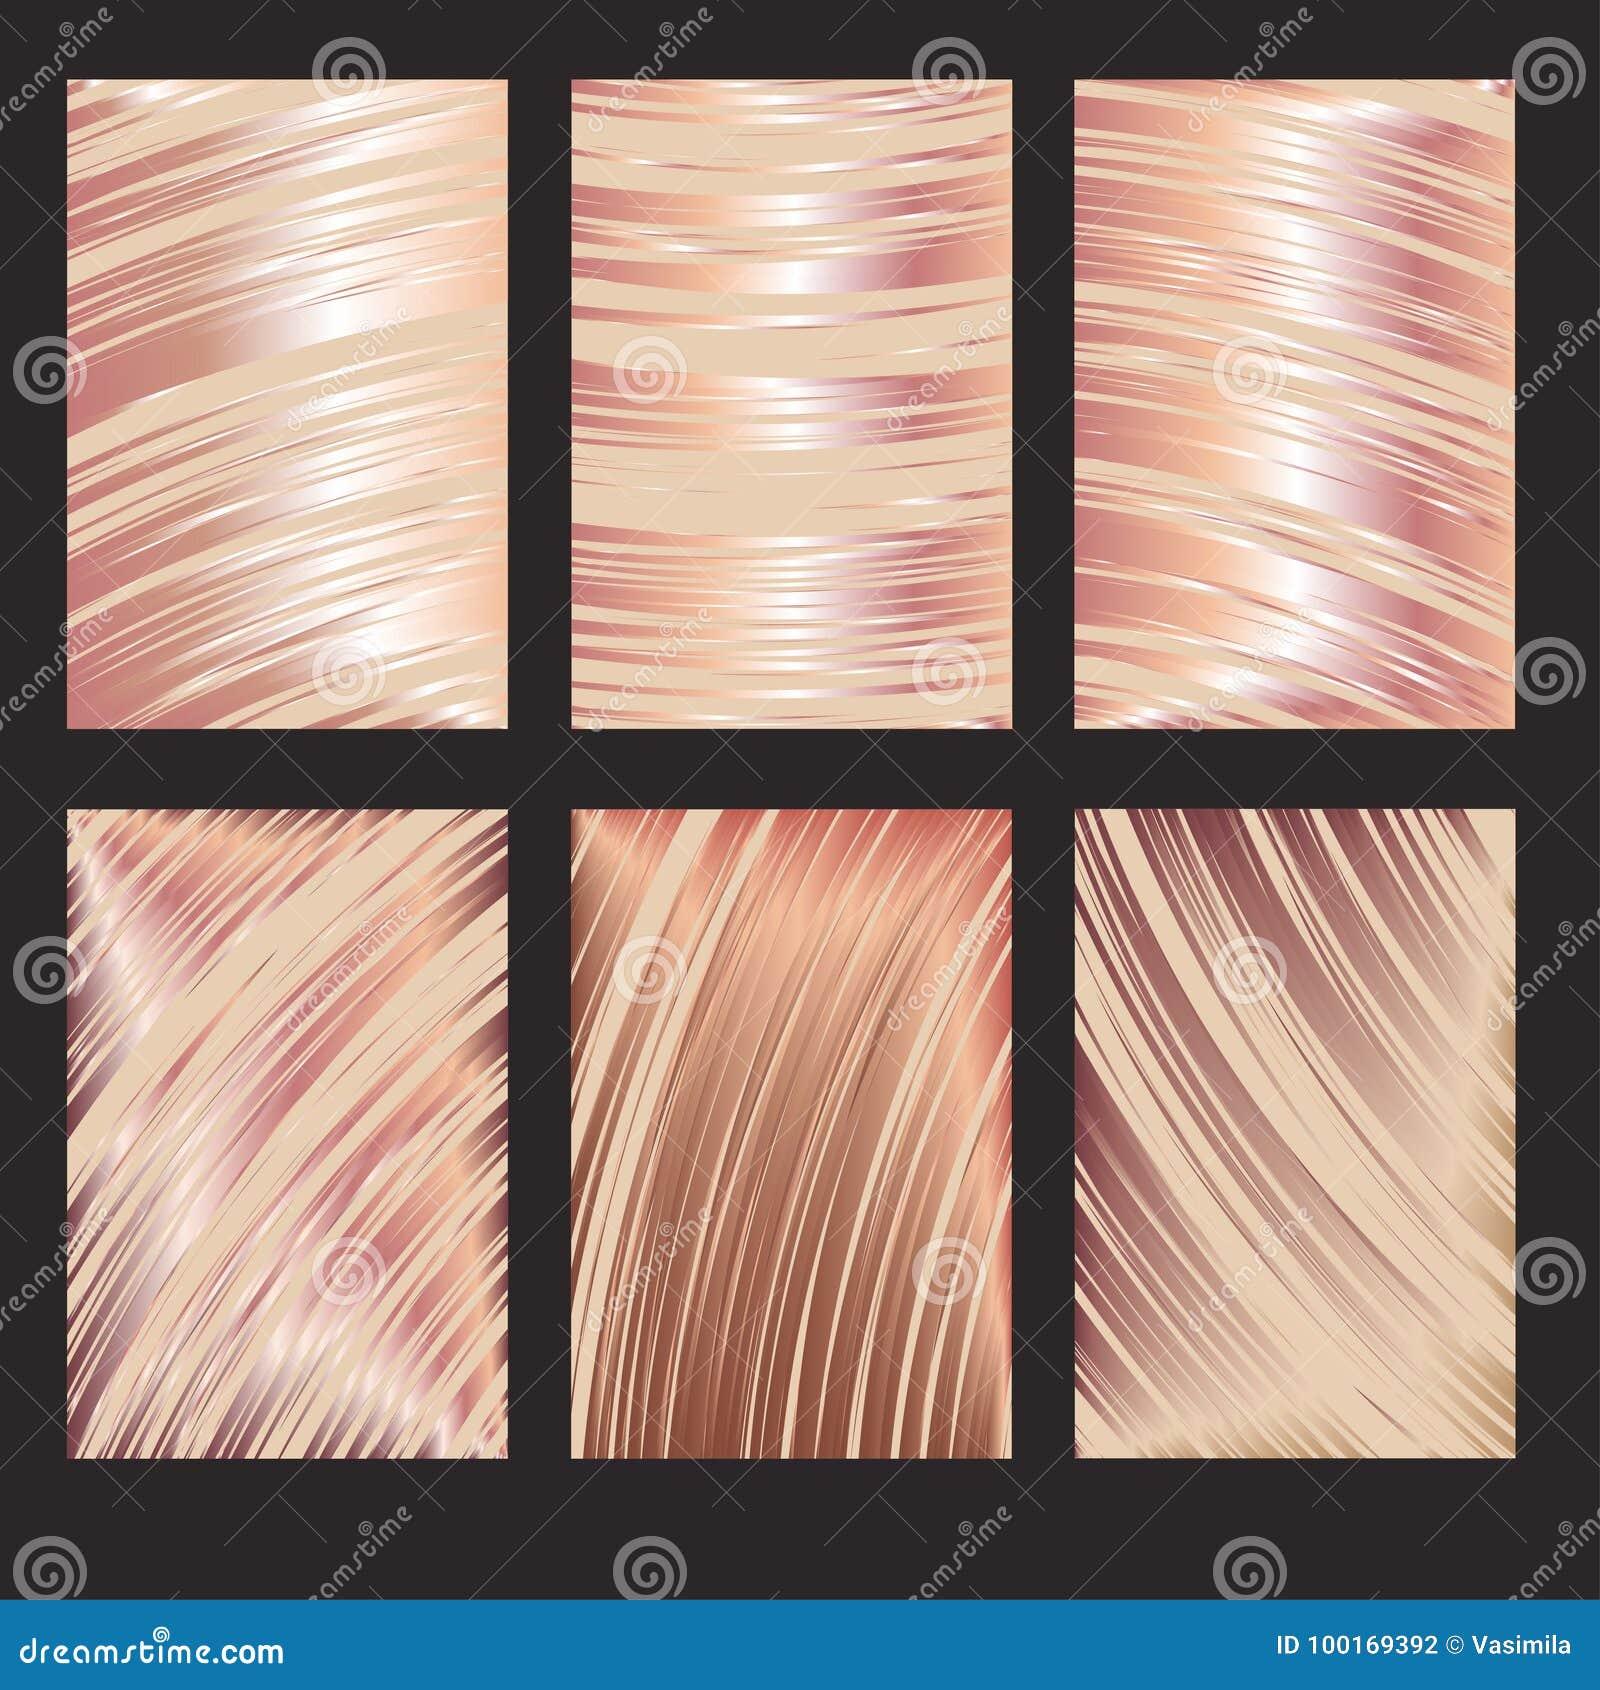 rose gold headline design stock vector illustration of metal